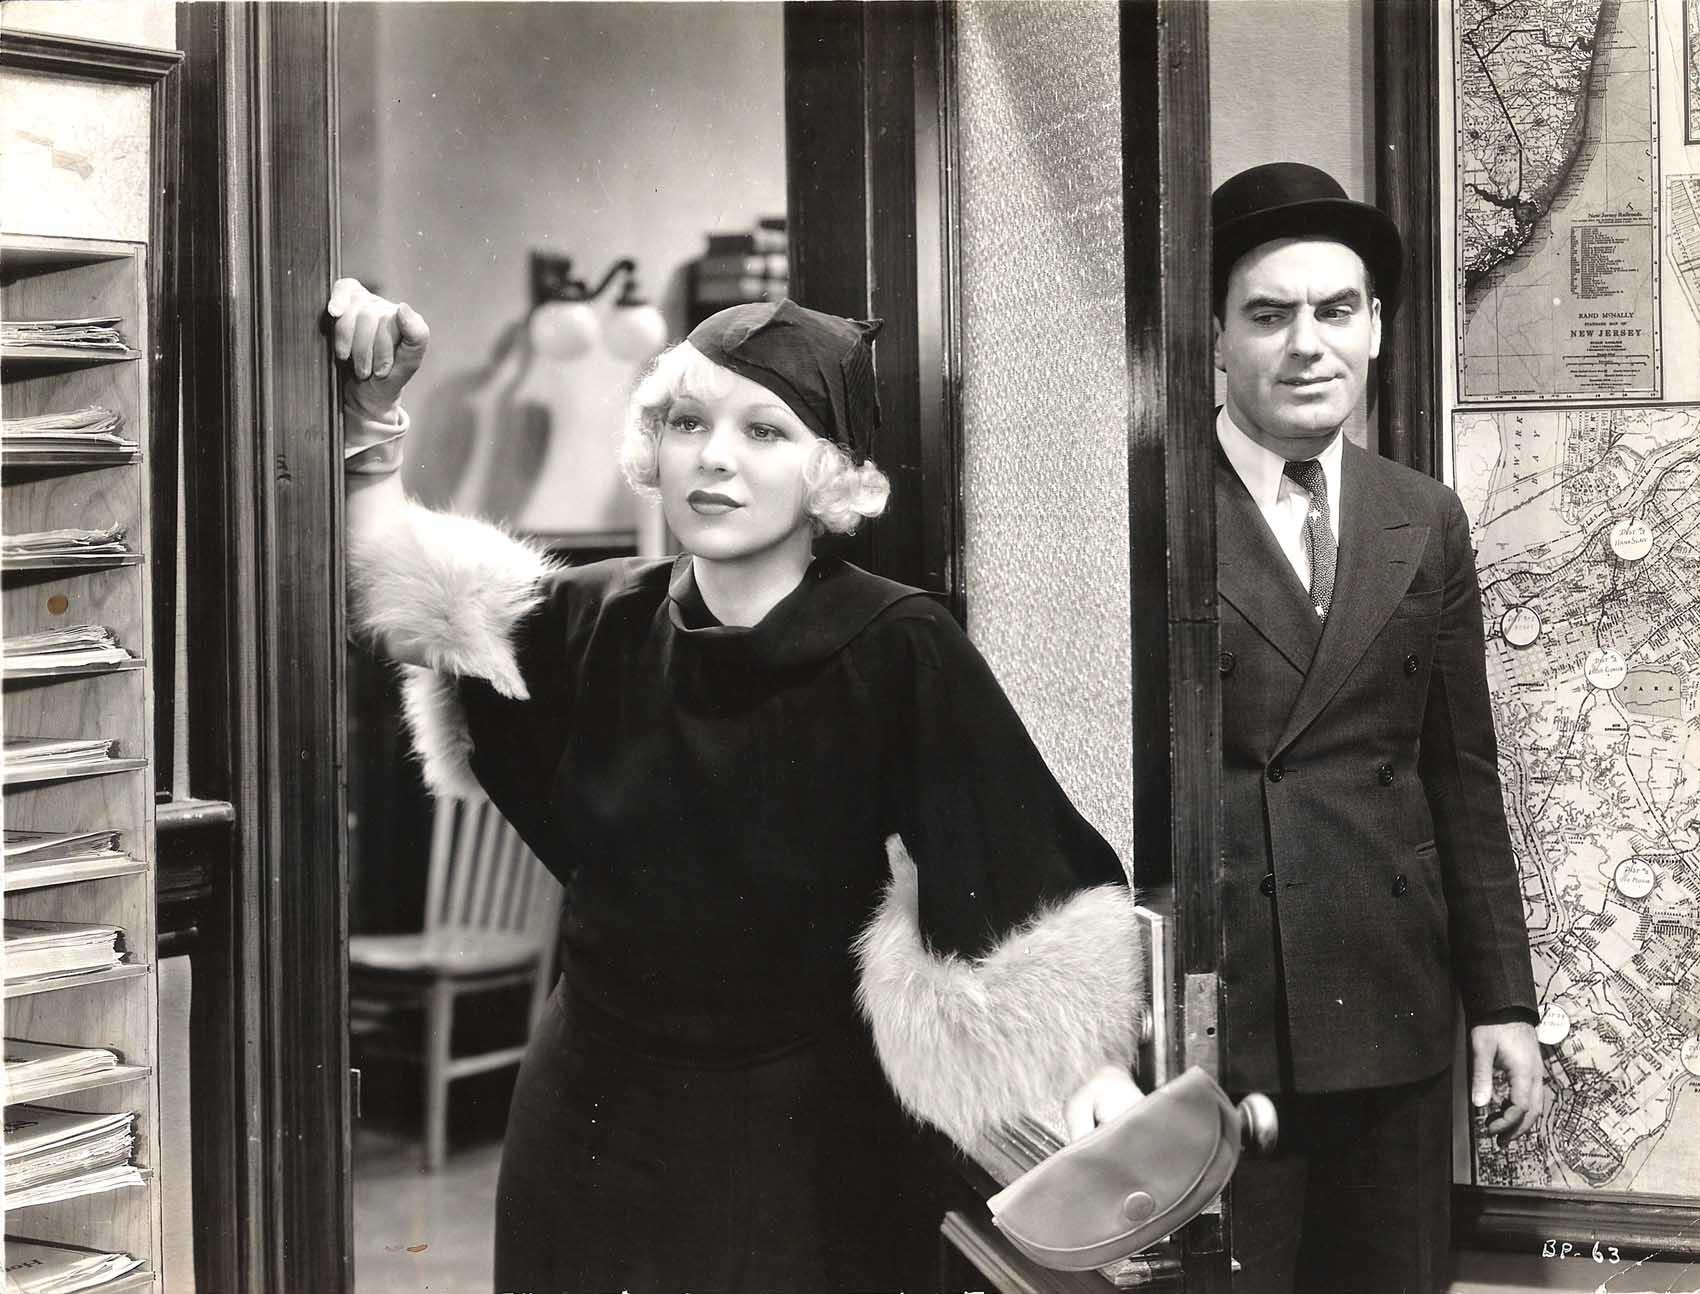 Pat O'Brien and Glenda Farrell in Bureau of Missing Persons (1933)